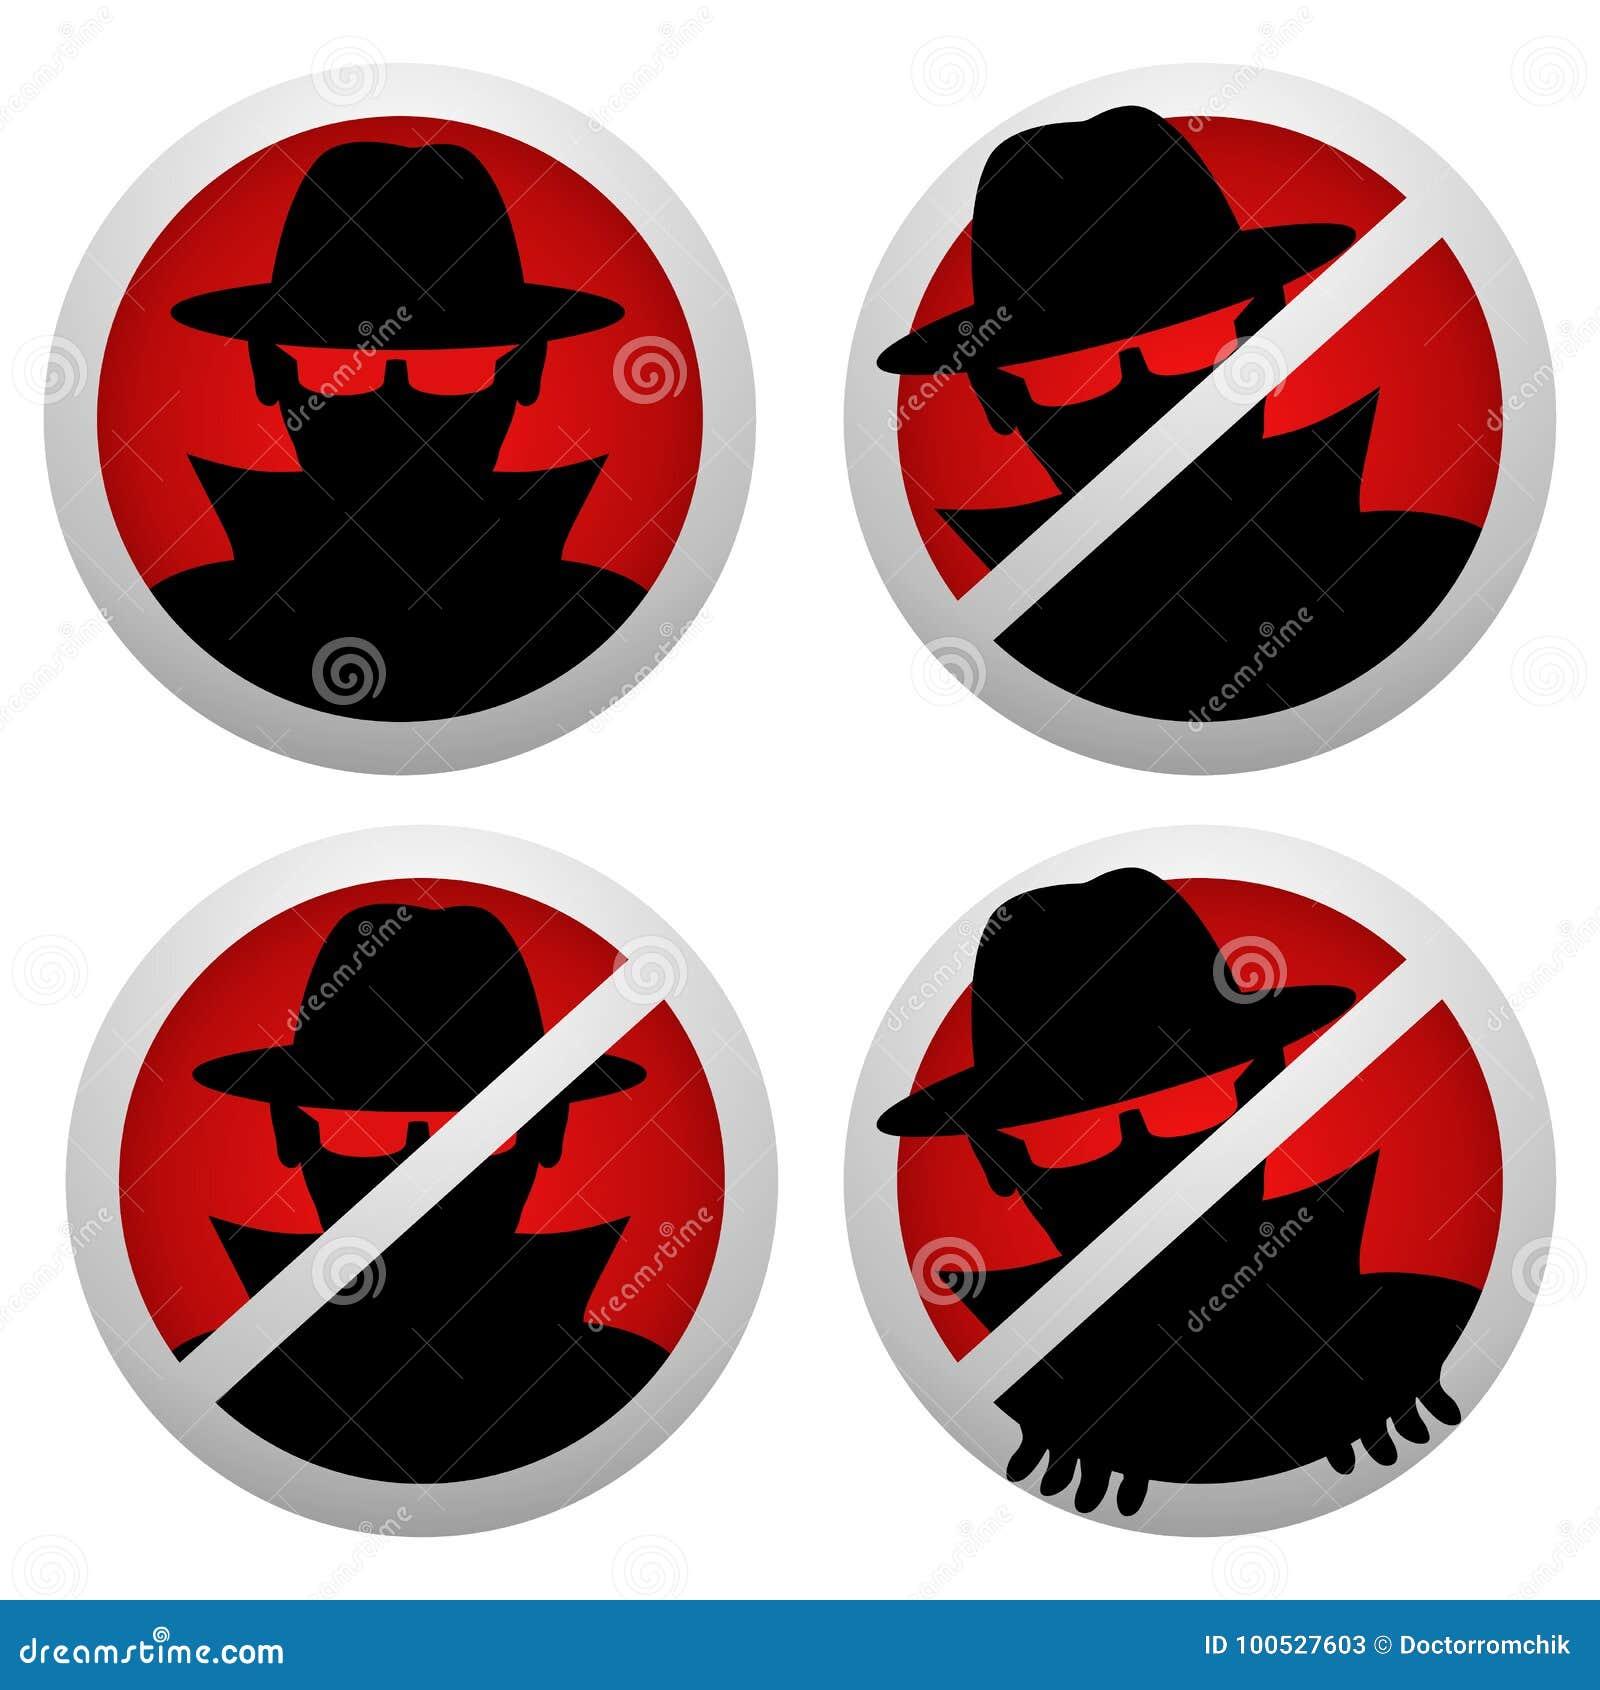 anti spy app free download